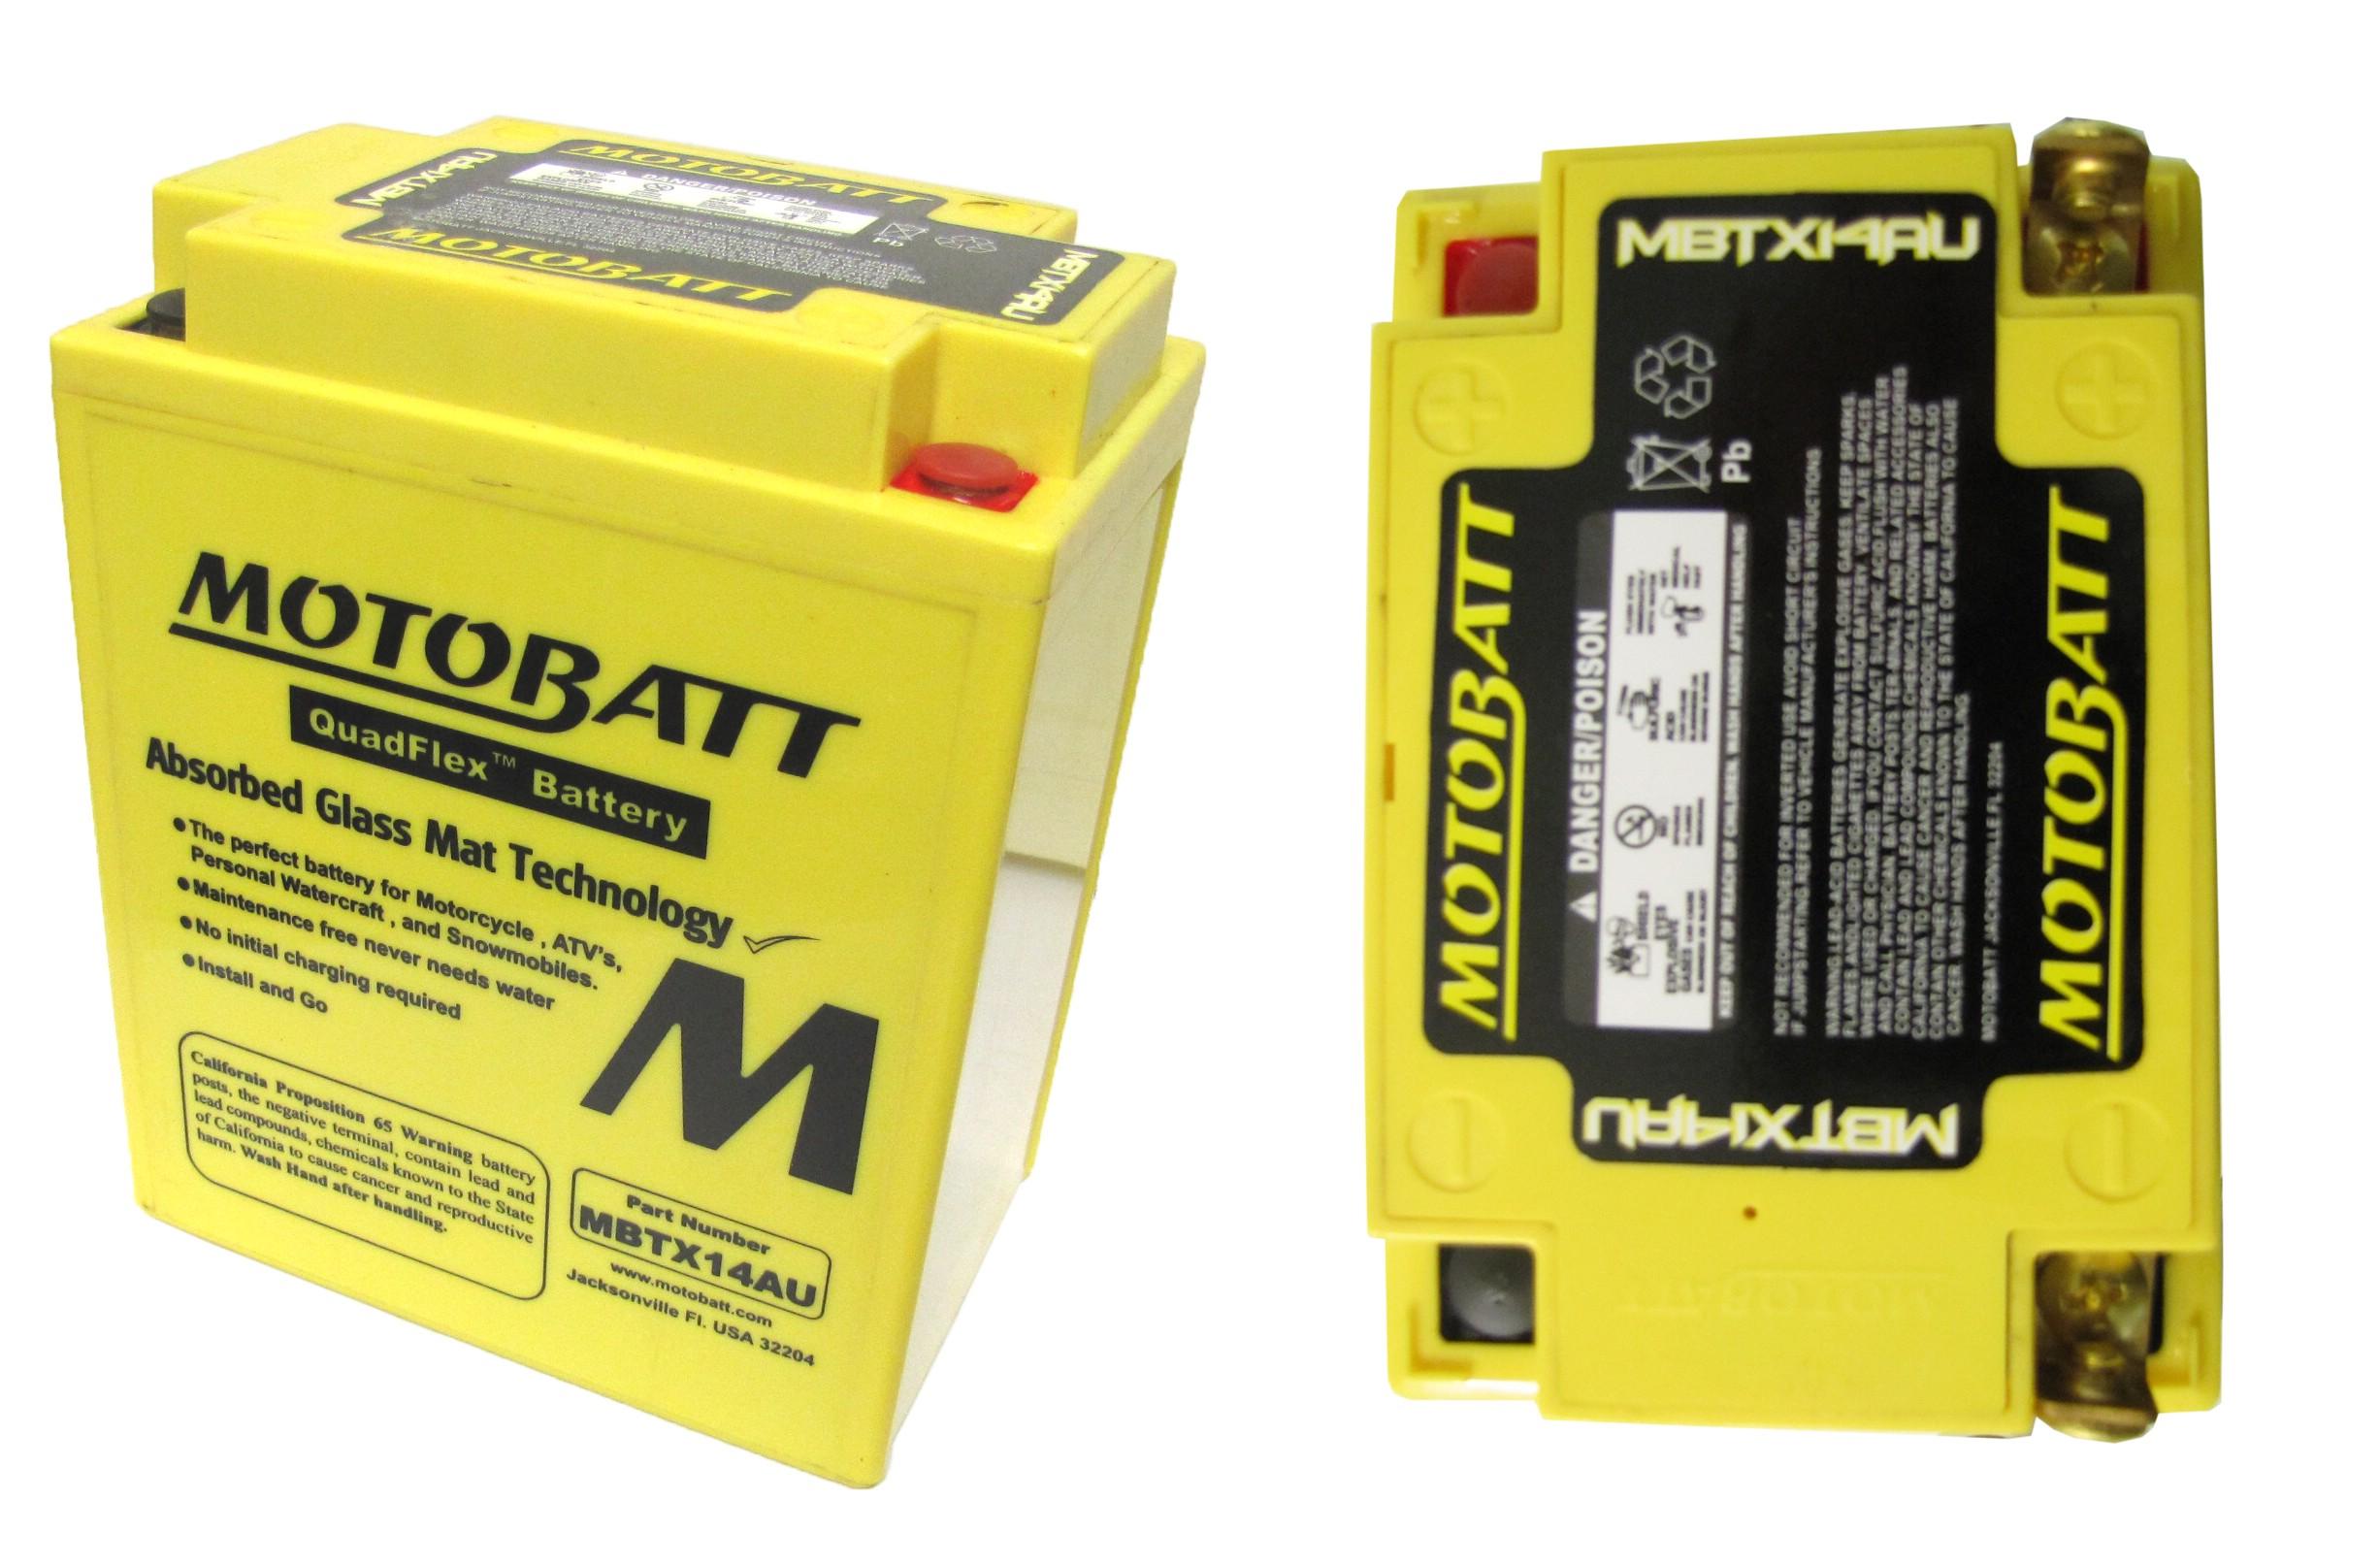 Motobatt-Battery-For-Suzuki-GS-850-GX-1981-0850-CC thumbnail 4